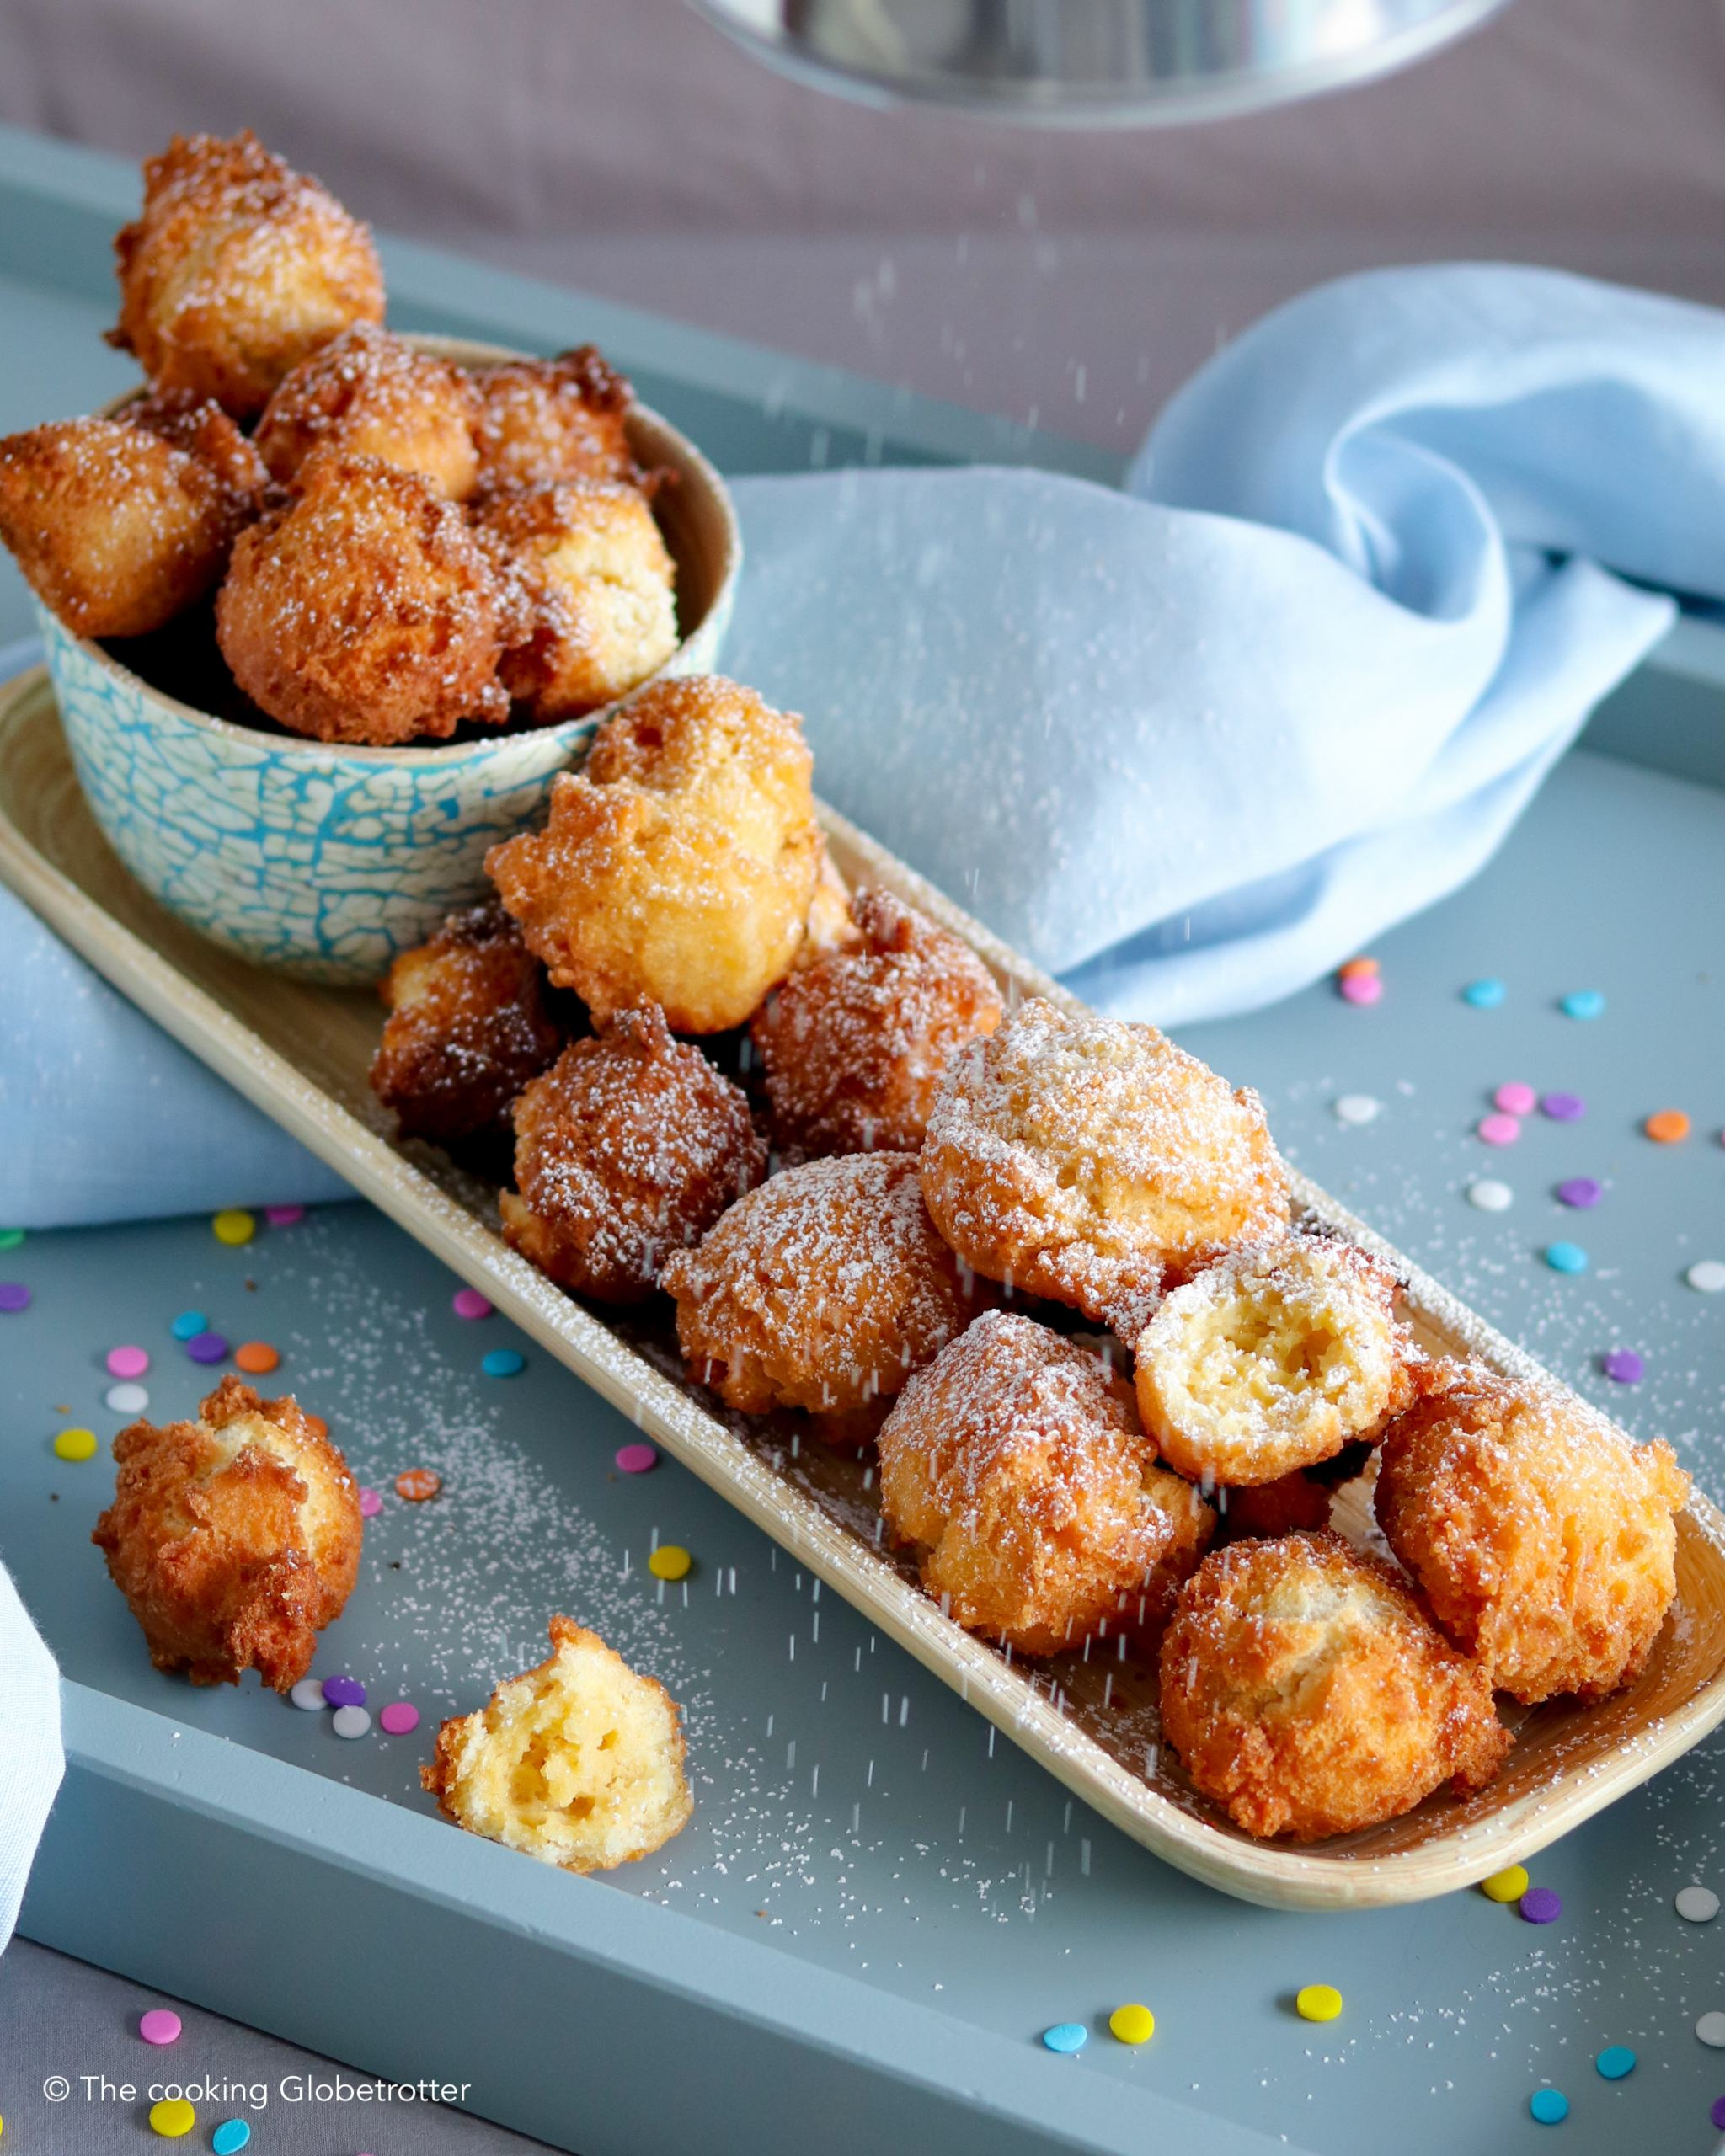 Main Italian Castagnole, Frappe, Strufoli fritters carnival fried dough sweets Italy recipe